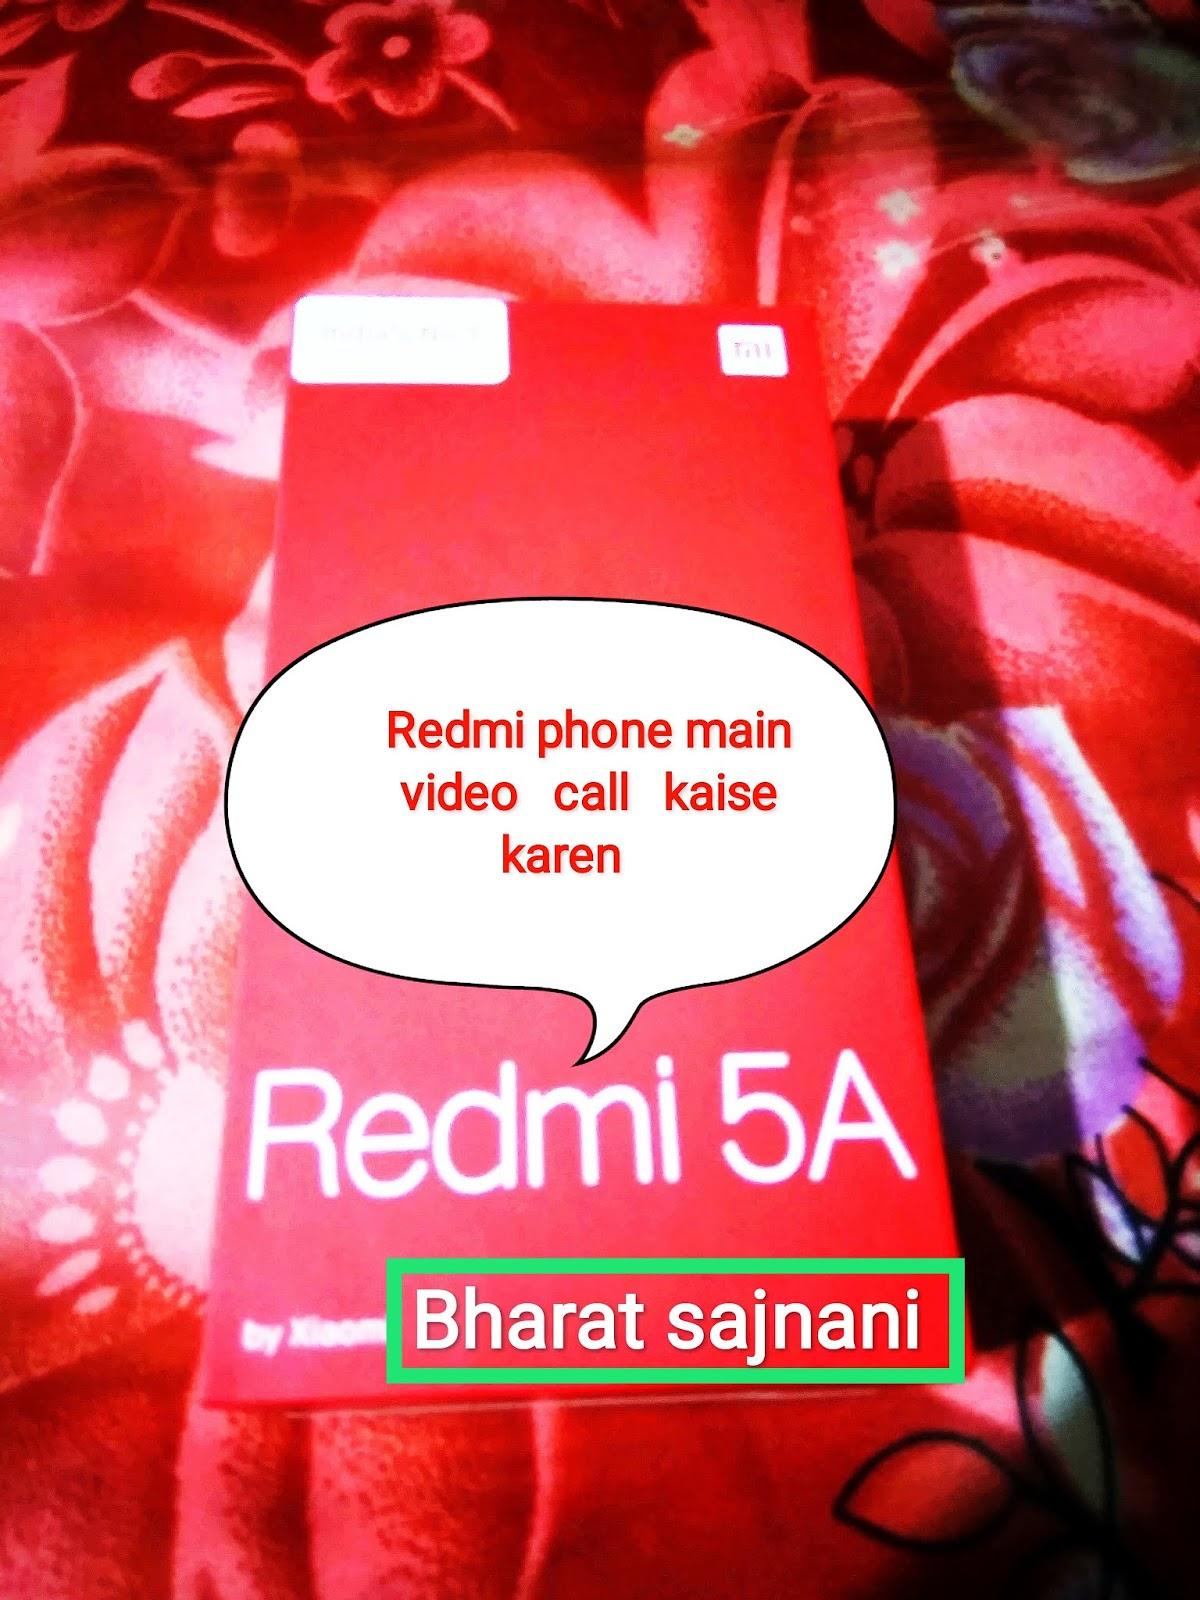 Redmi 5A me direct video call kaise karen , video call kaise